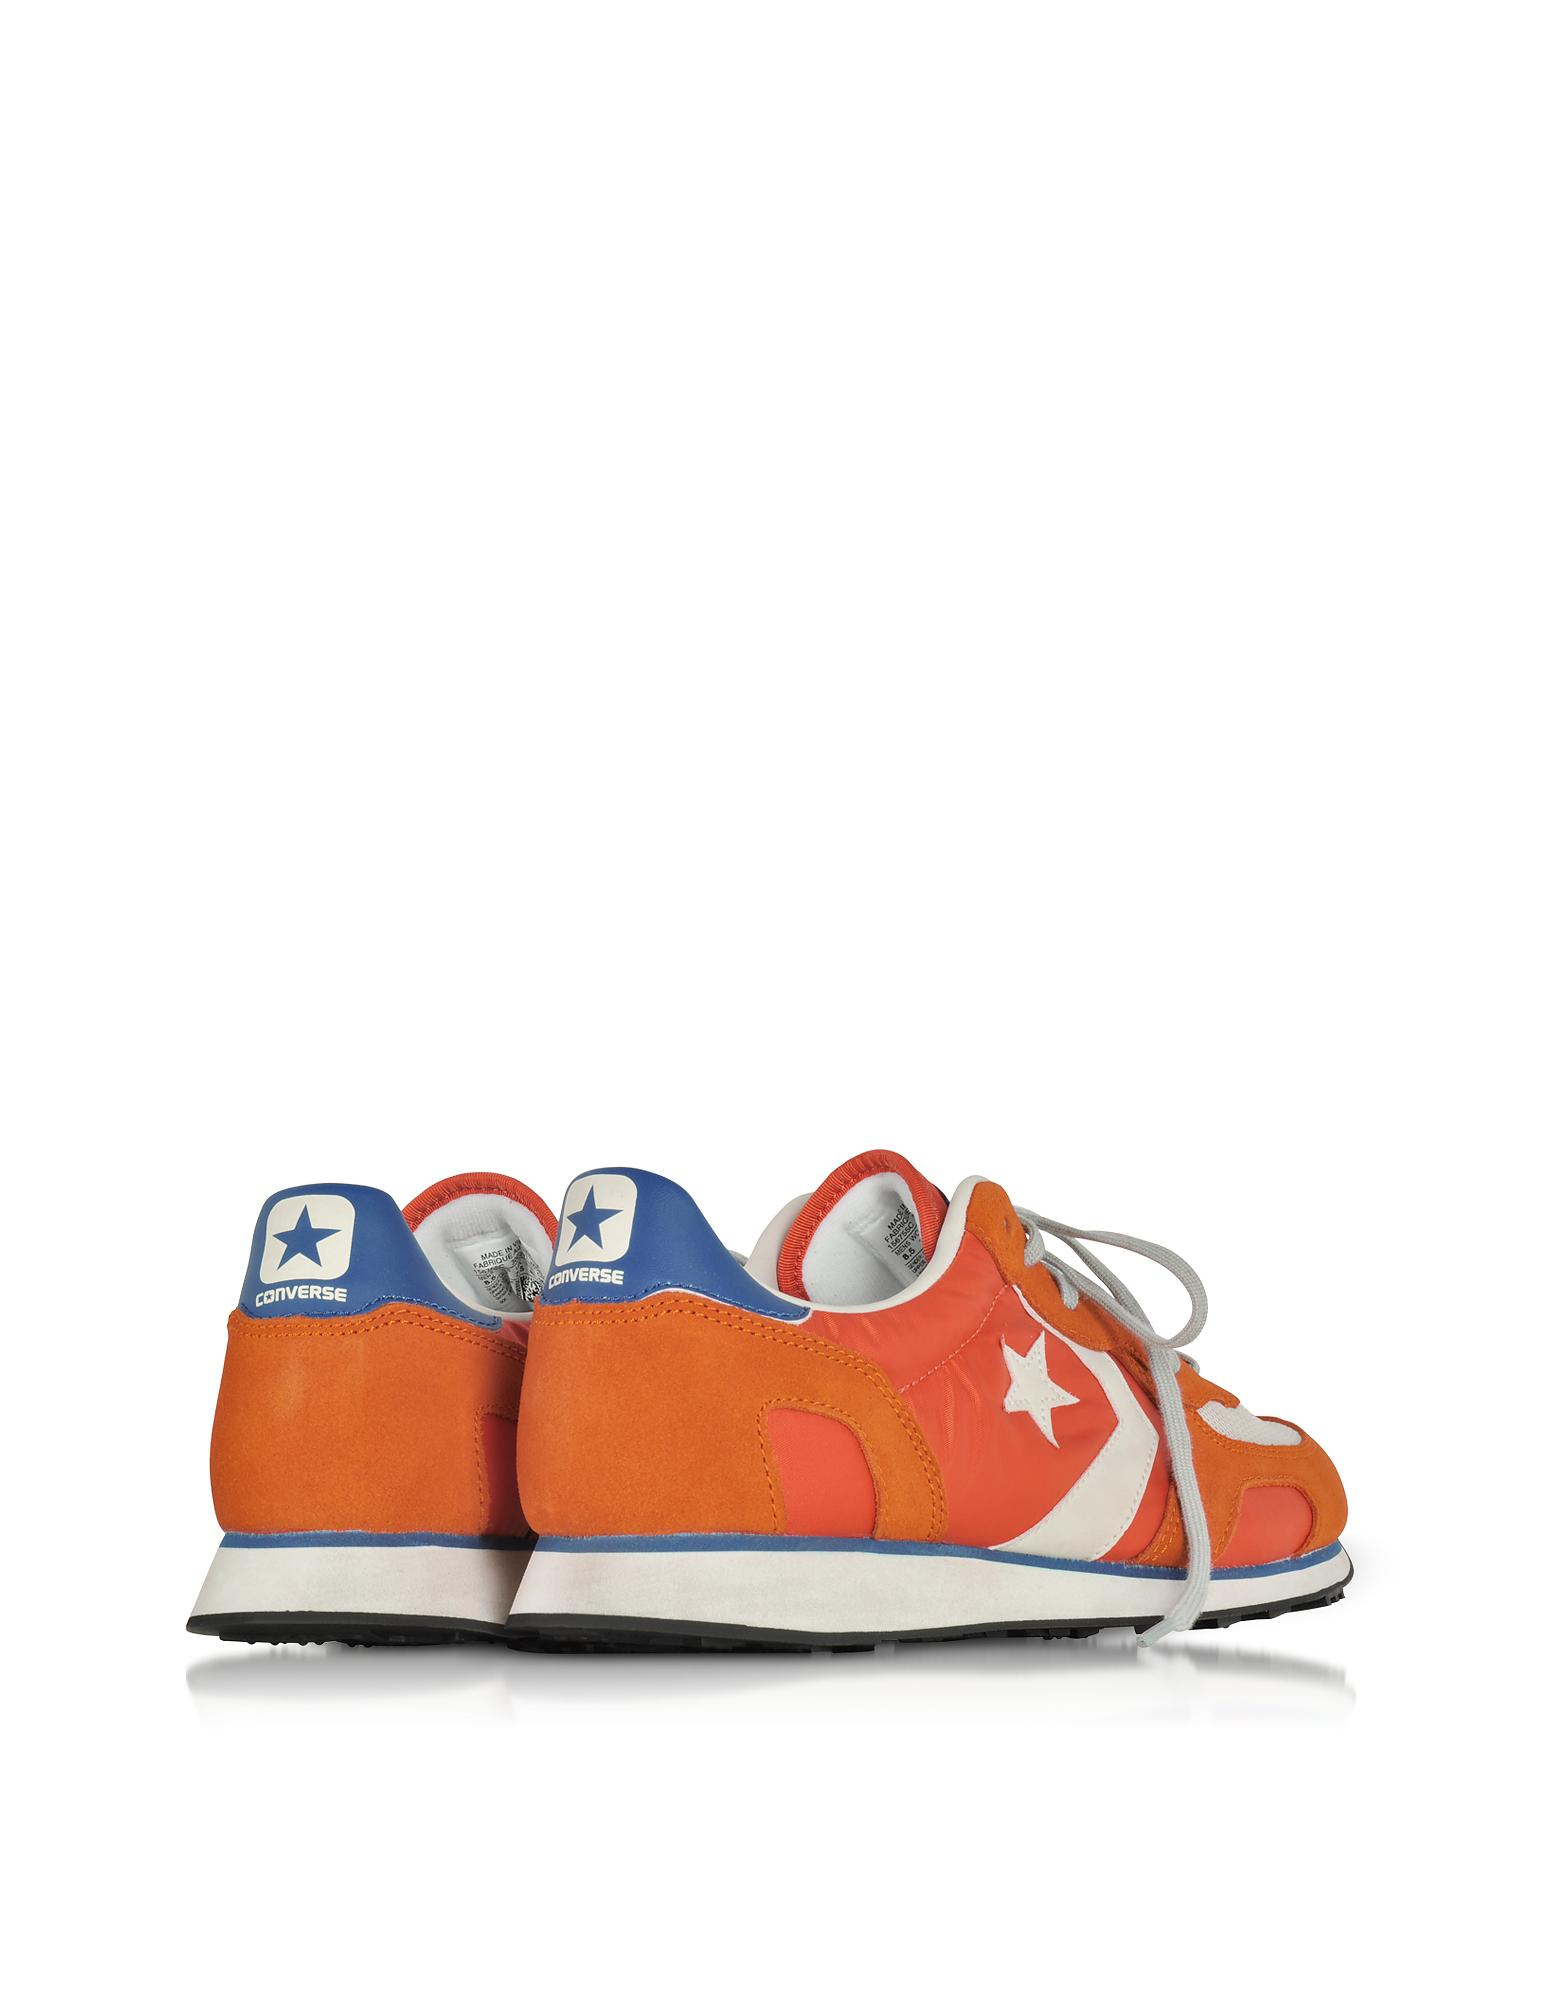 Lyst Converse Men's Orange Suede in Sneakers in Suede Orange 584b4f